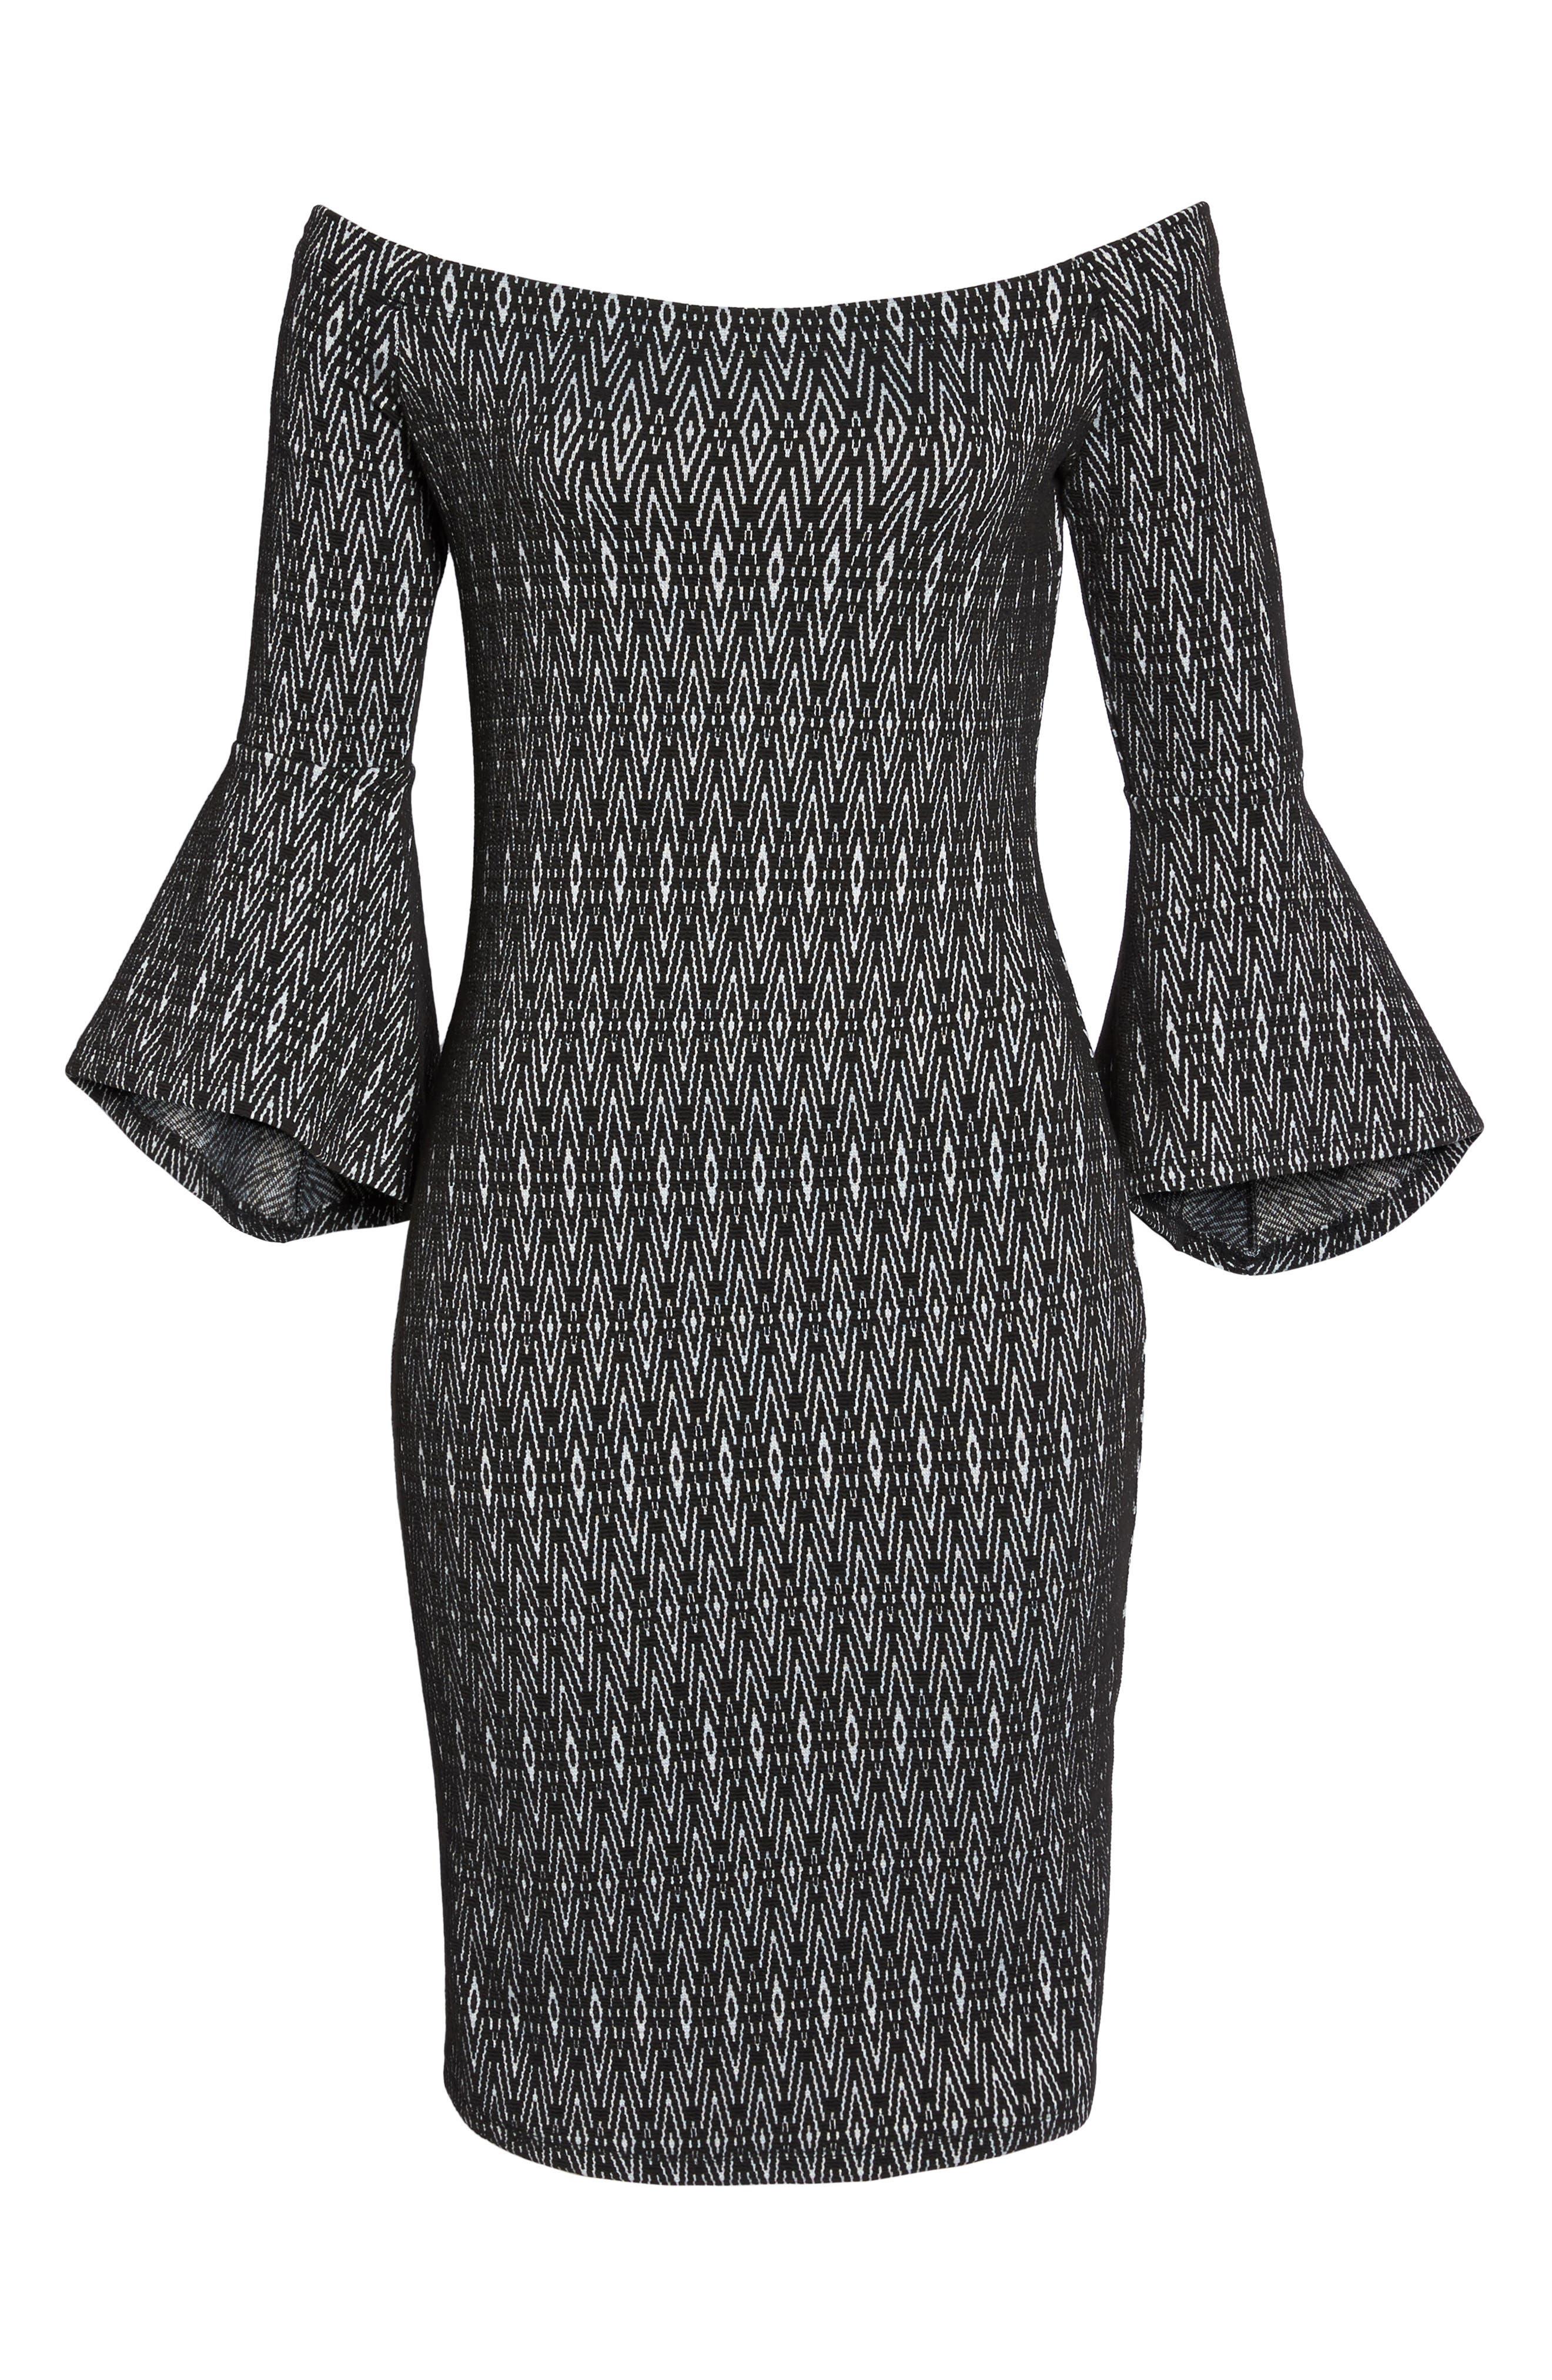 Off the Shoulder Sheath Dress,                             Alternate thumbnail 6, color,